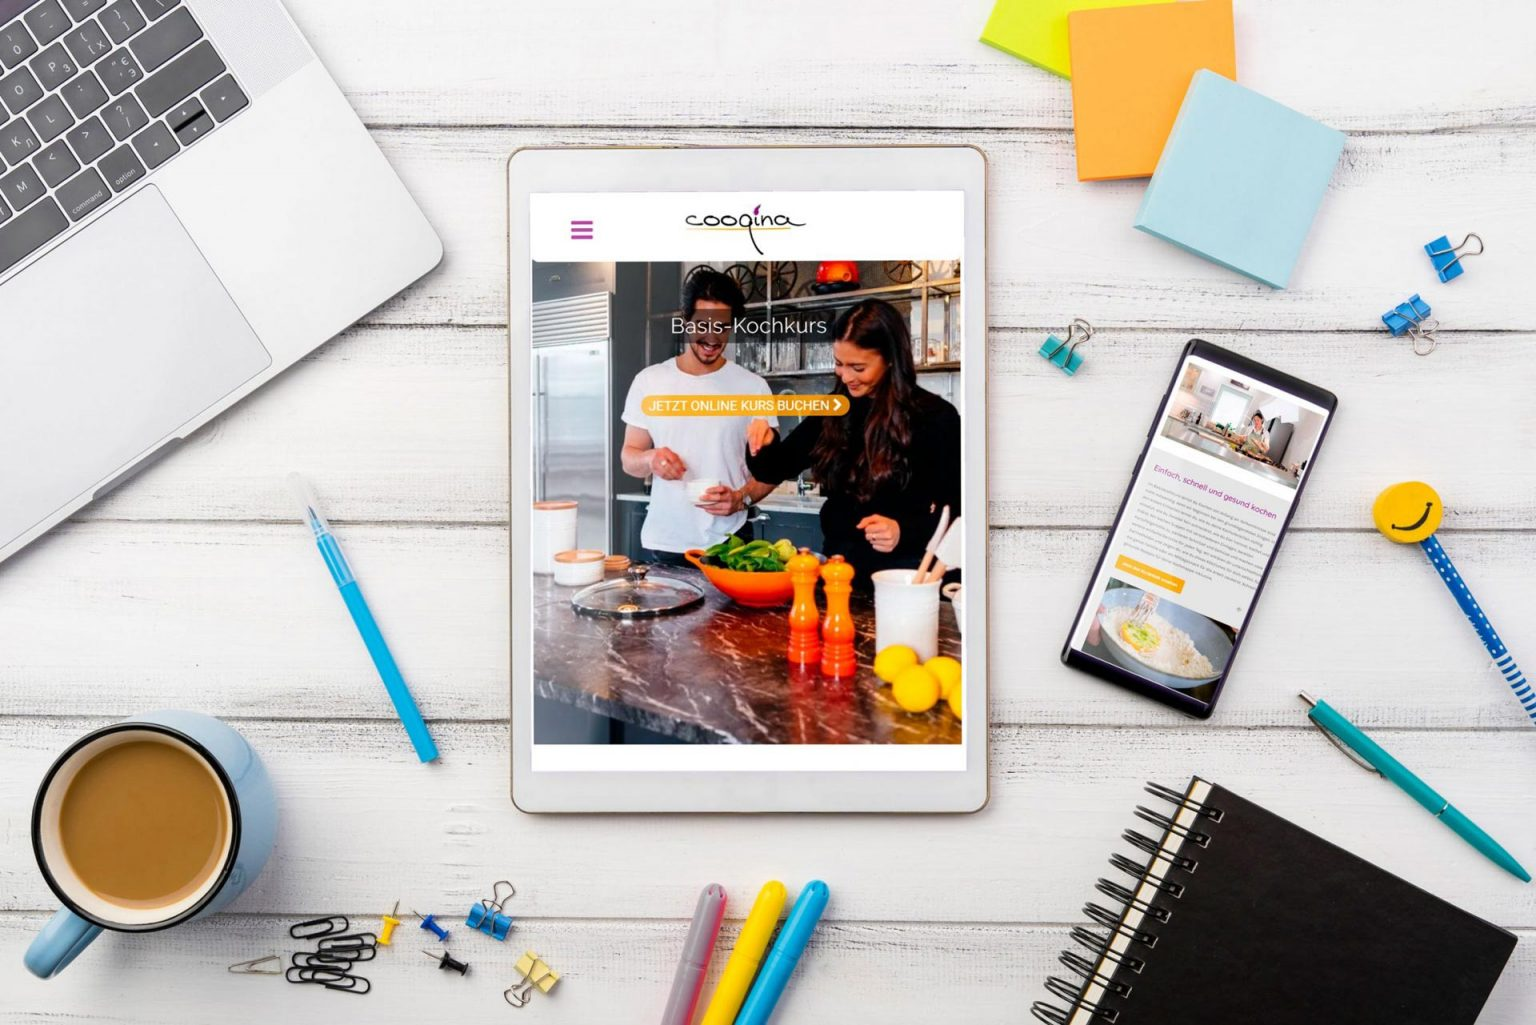 Cooqina | Online Kochschule Webdesign